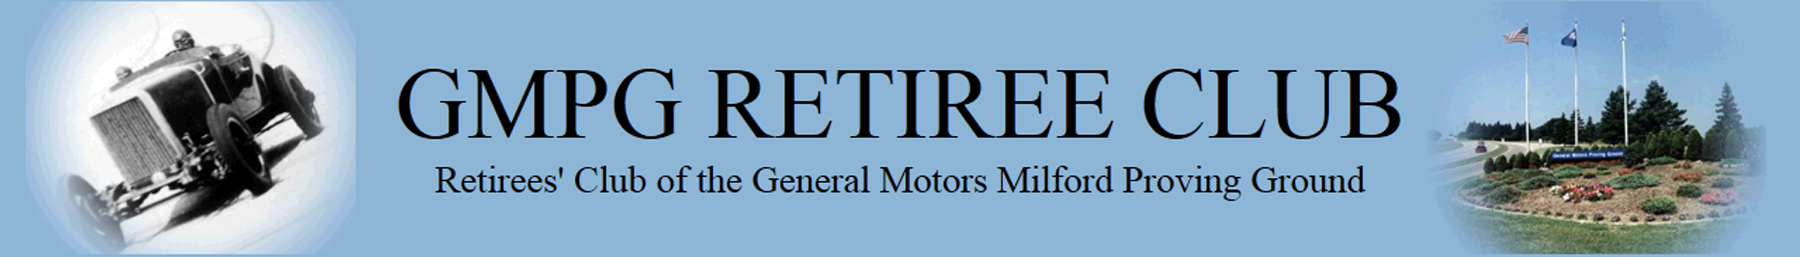 GMPG Retiree Club